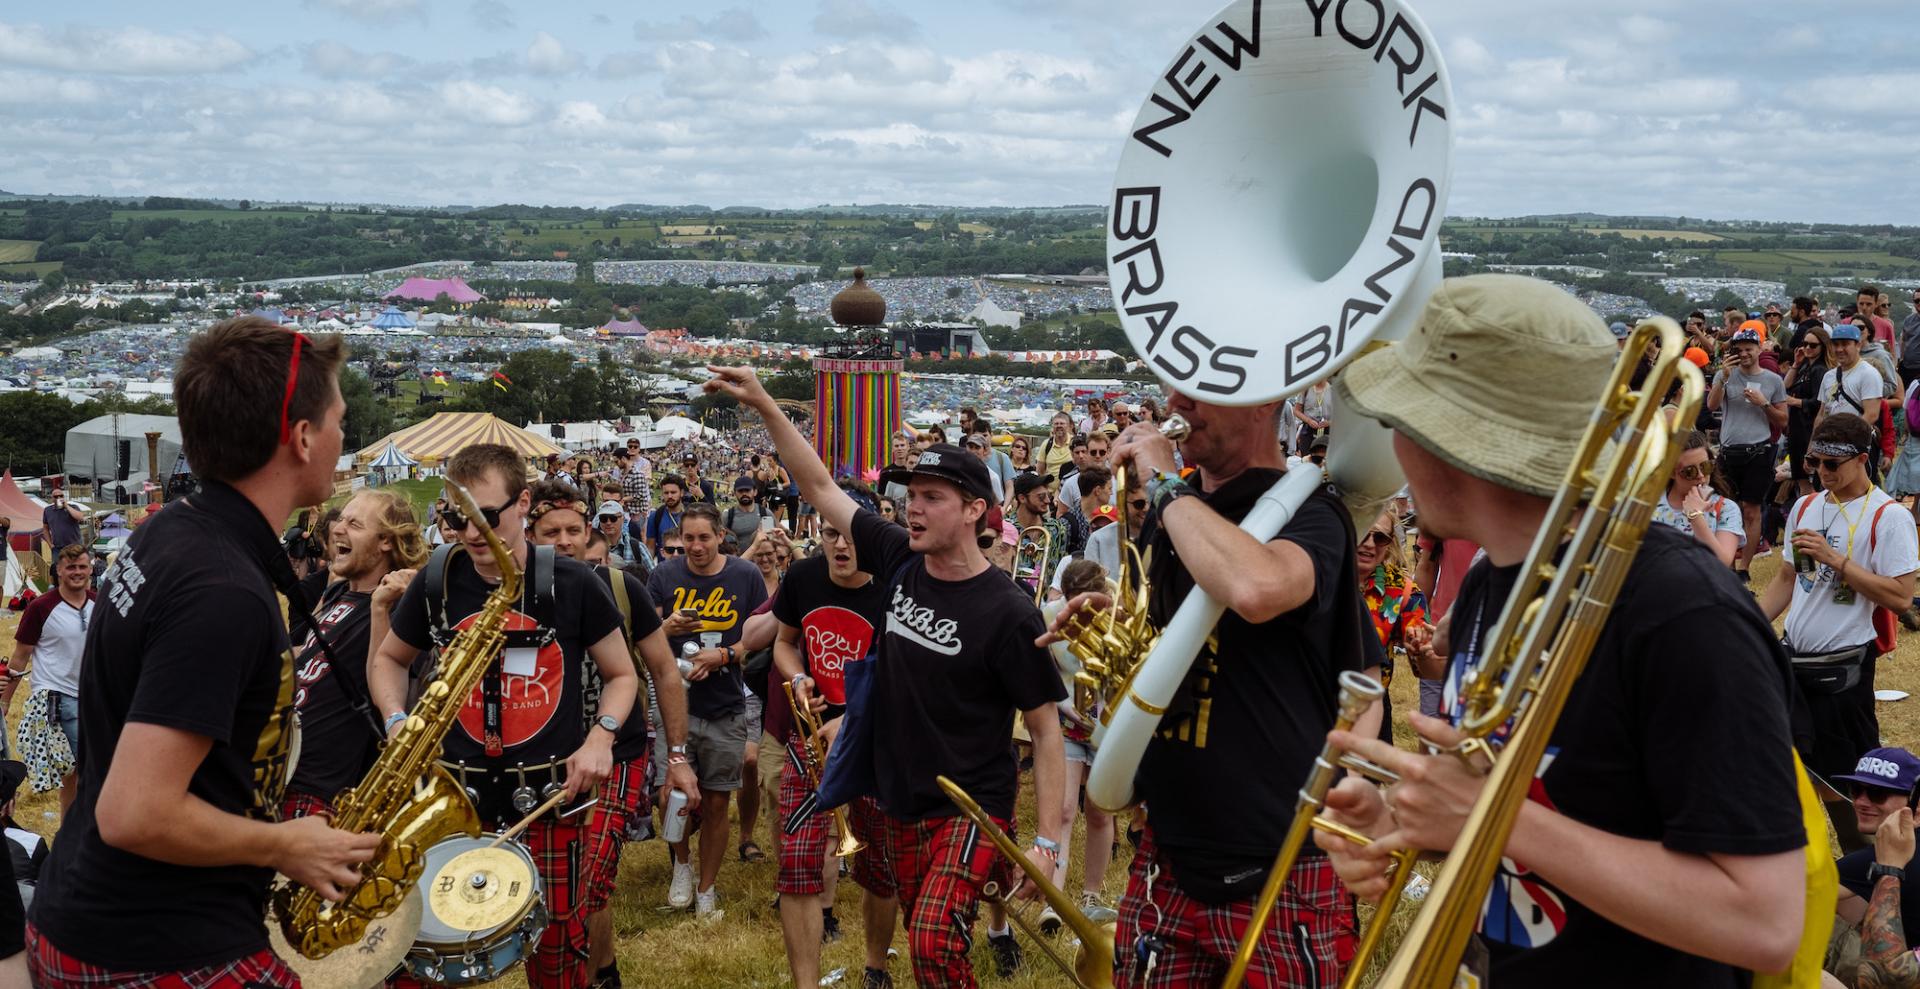 Leeds Jazz Festival event: New York Brass Band